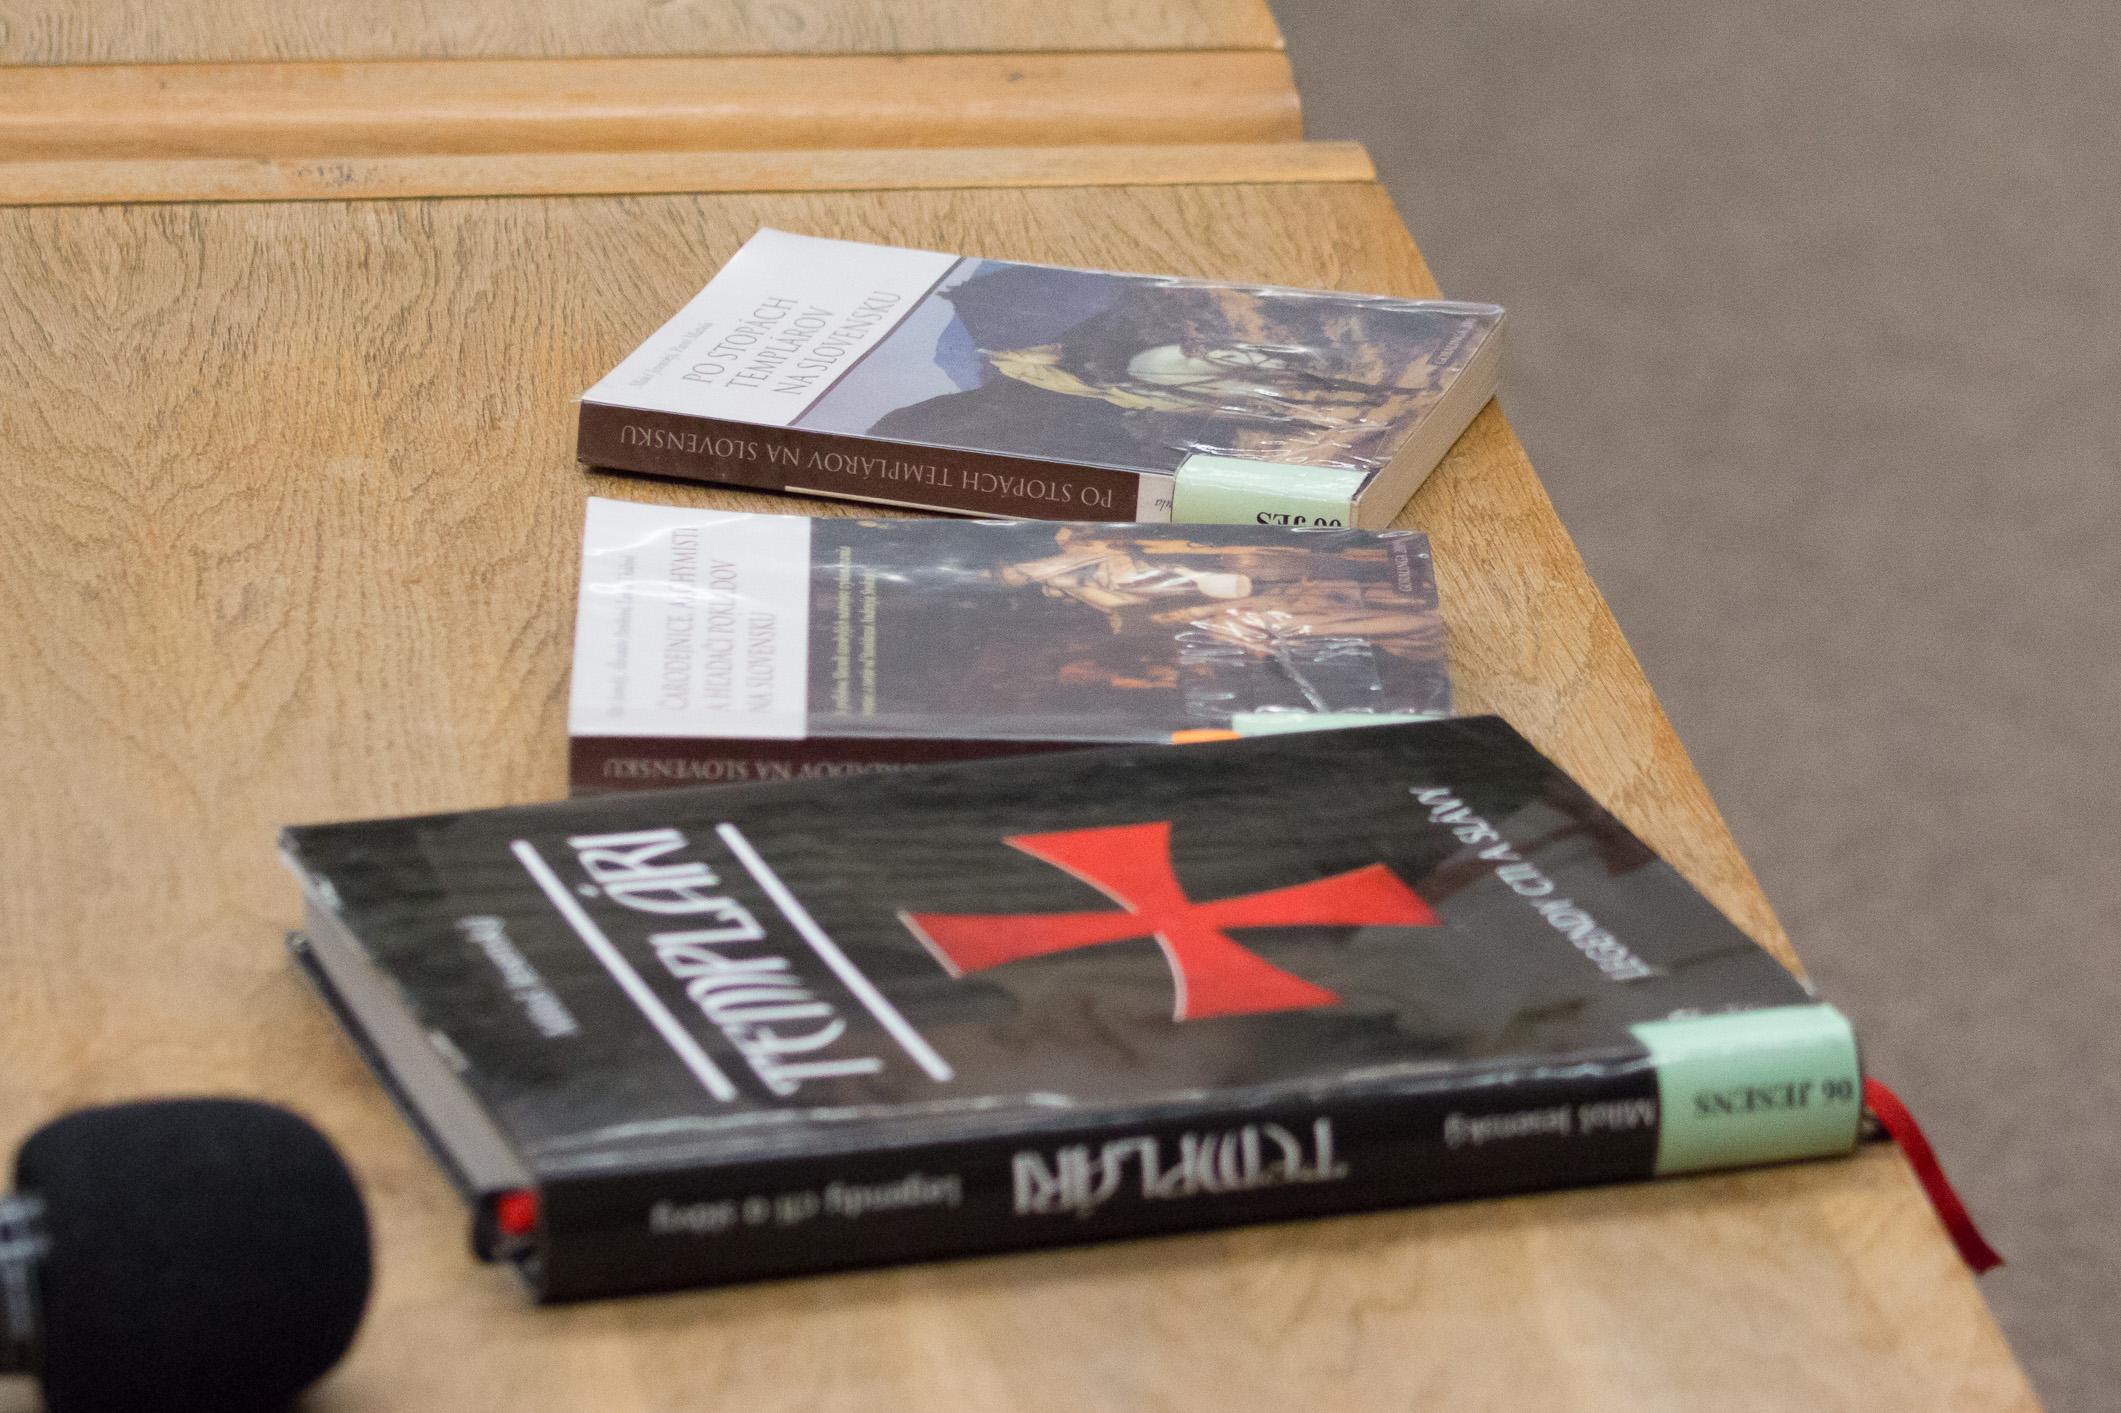 milos-jesensky-knihy